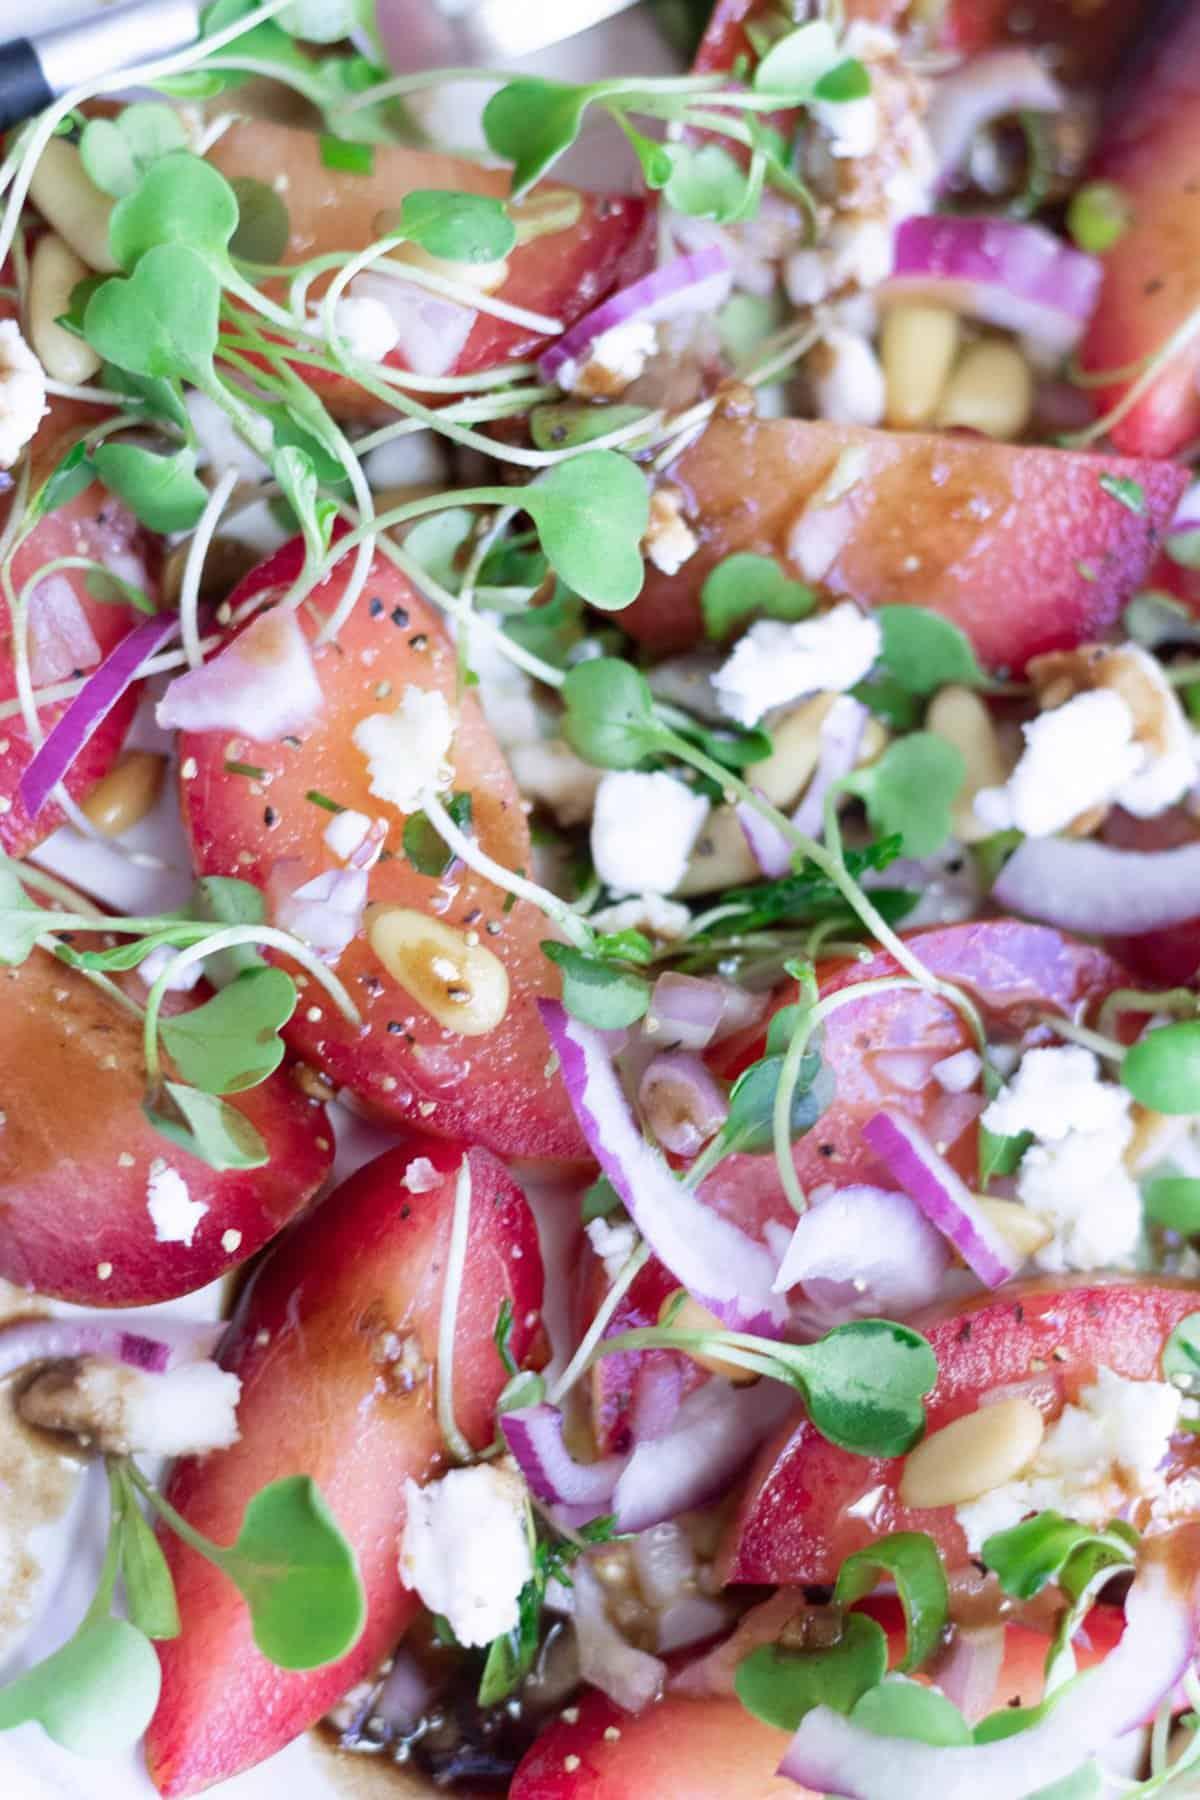 Plumcot Salad